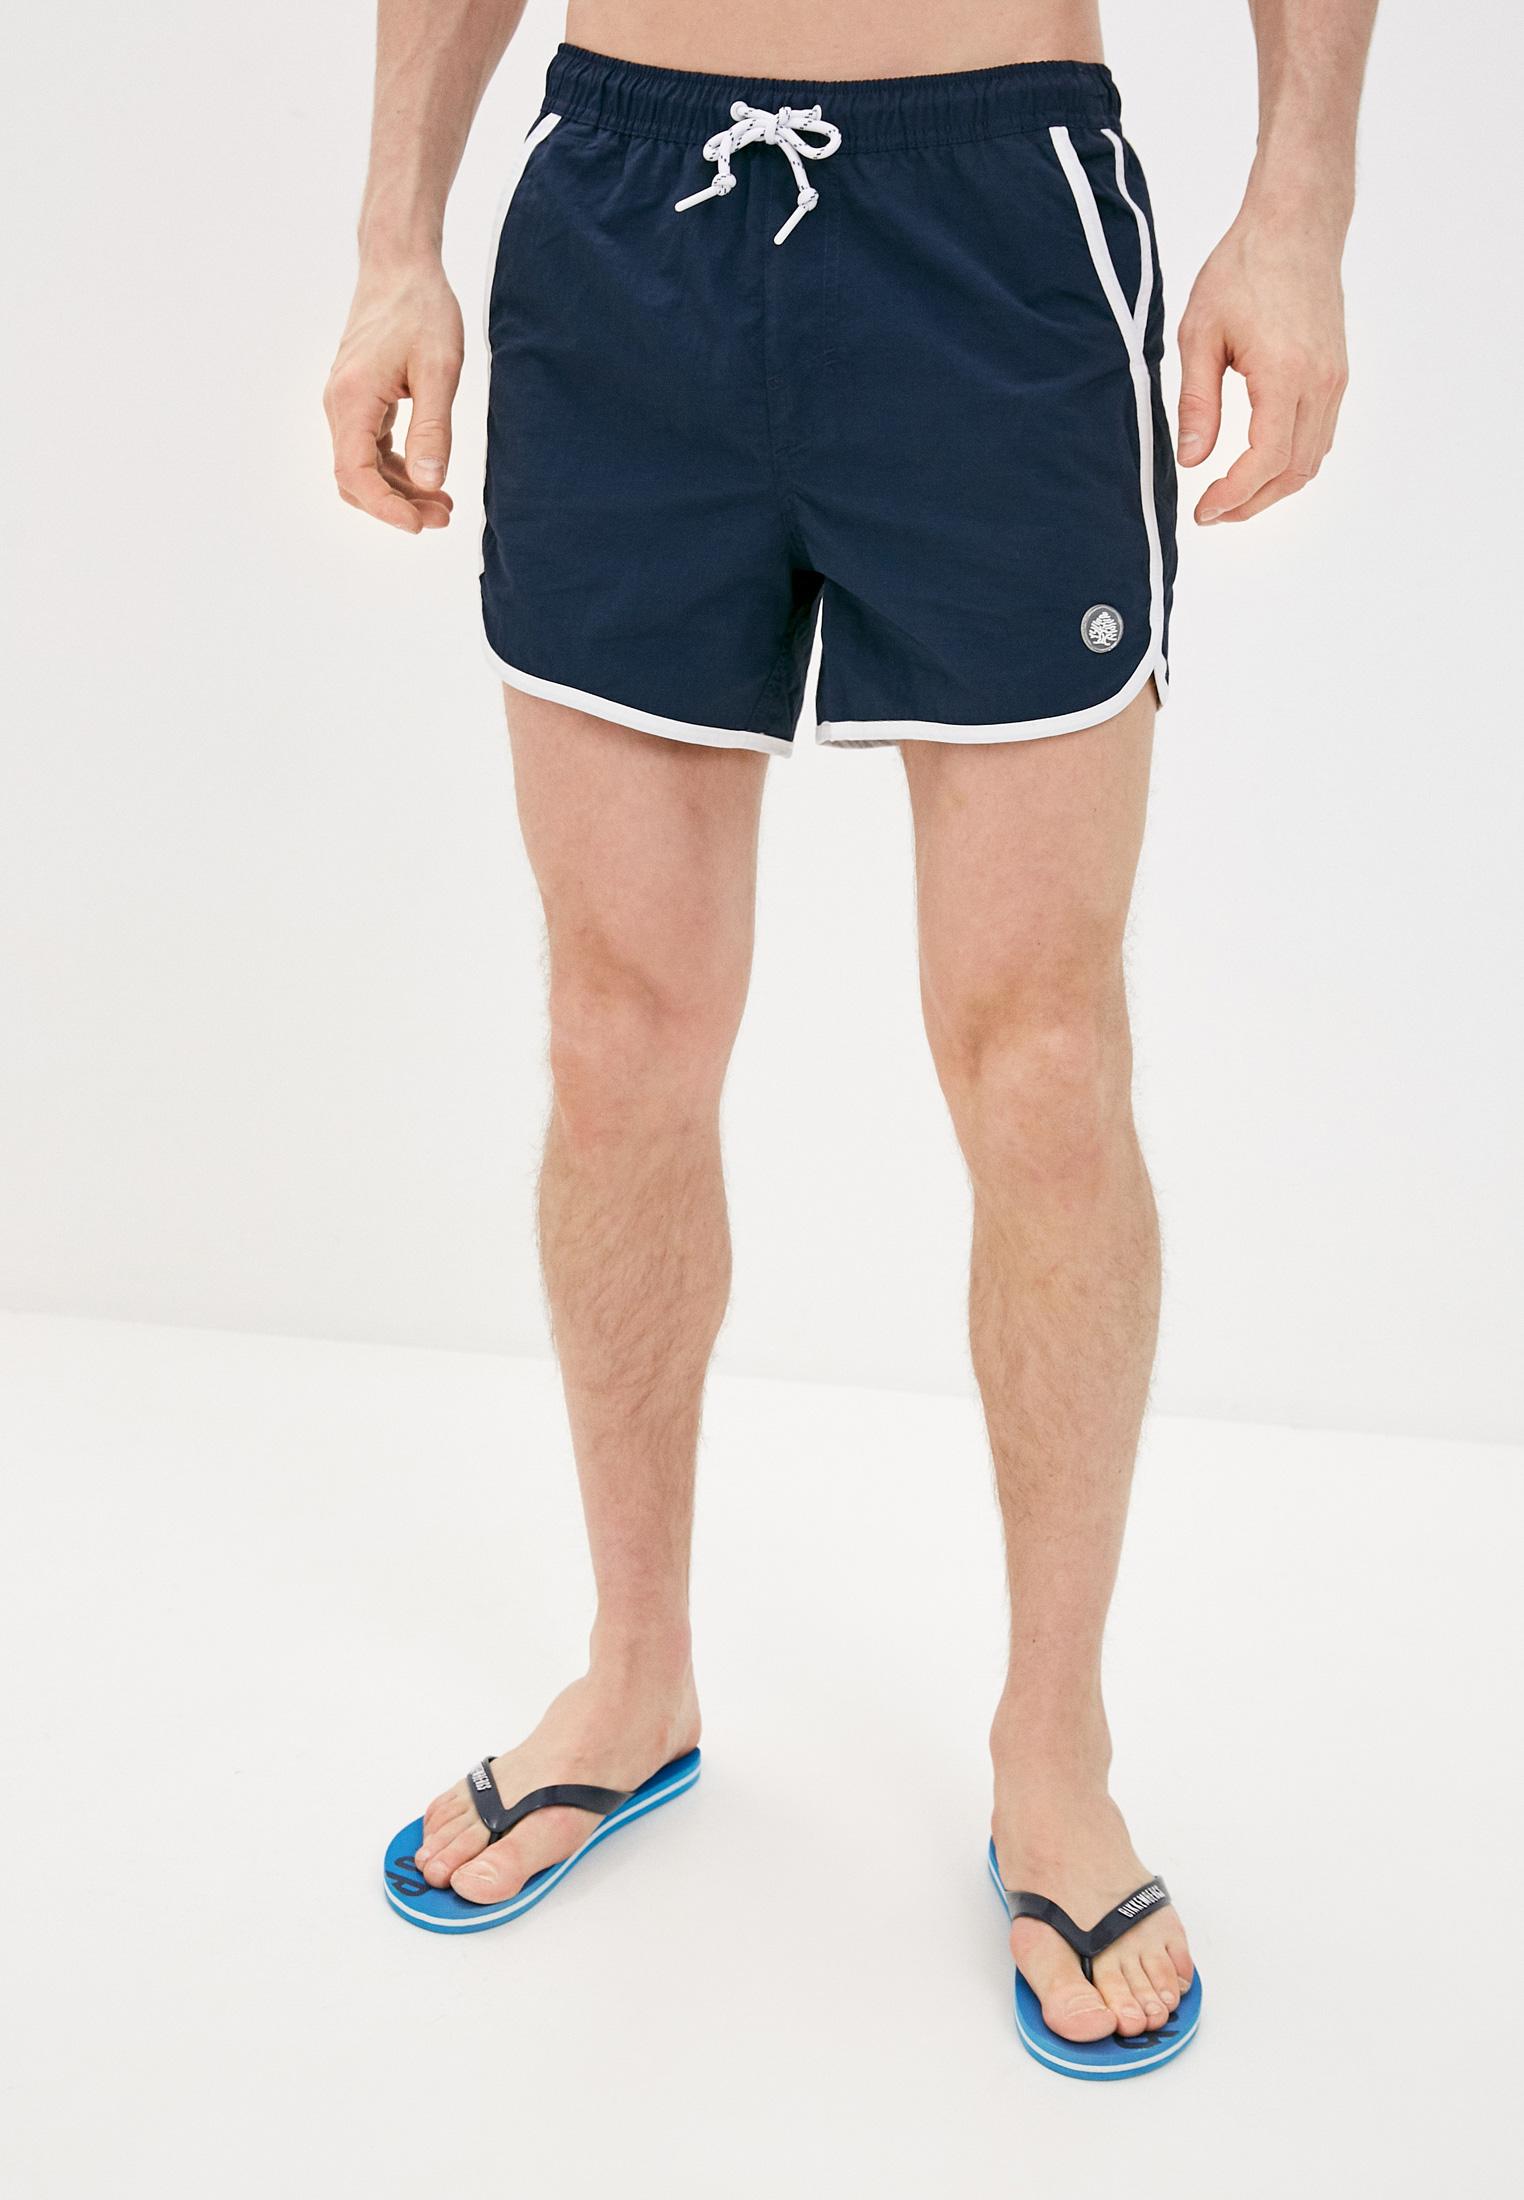 Мужские шорты для плавания SPRINGFIELD 599271